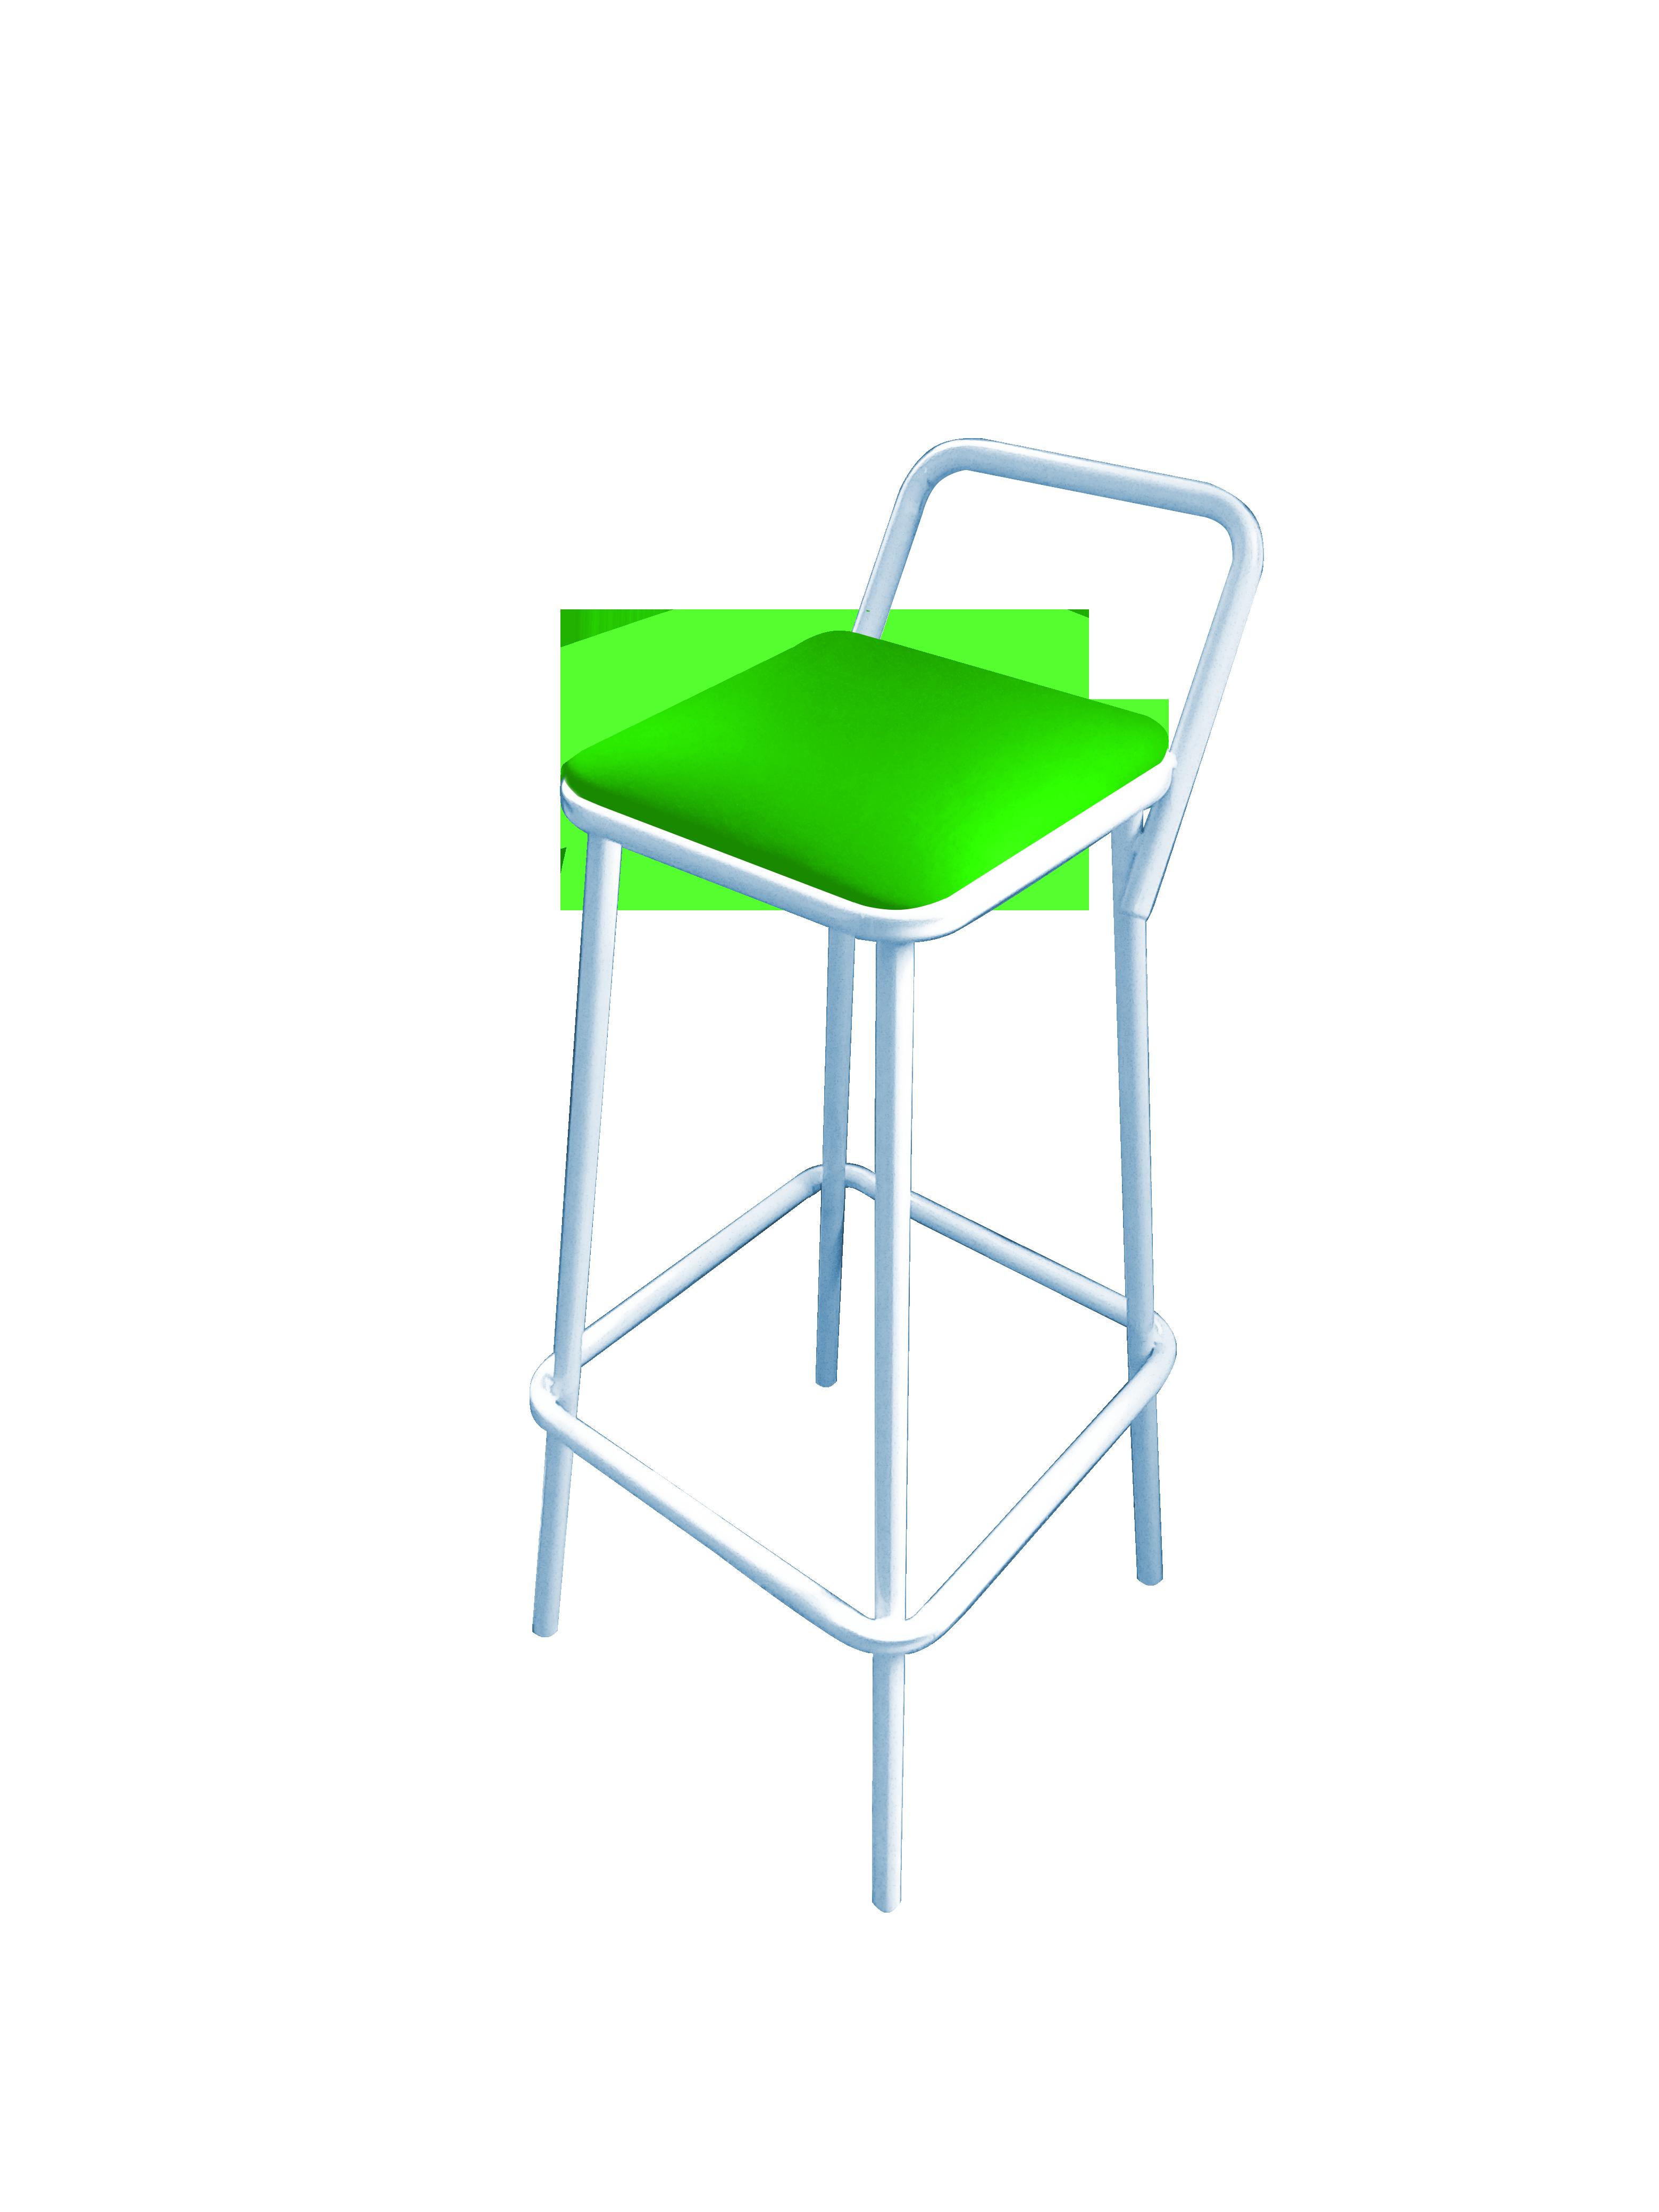 Quadrada verde